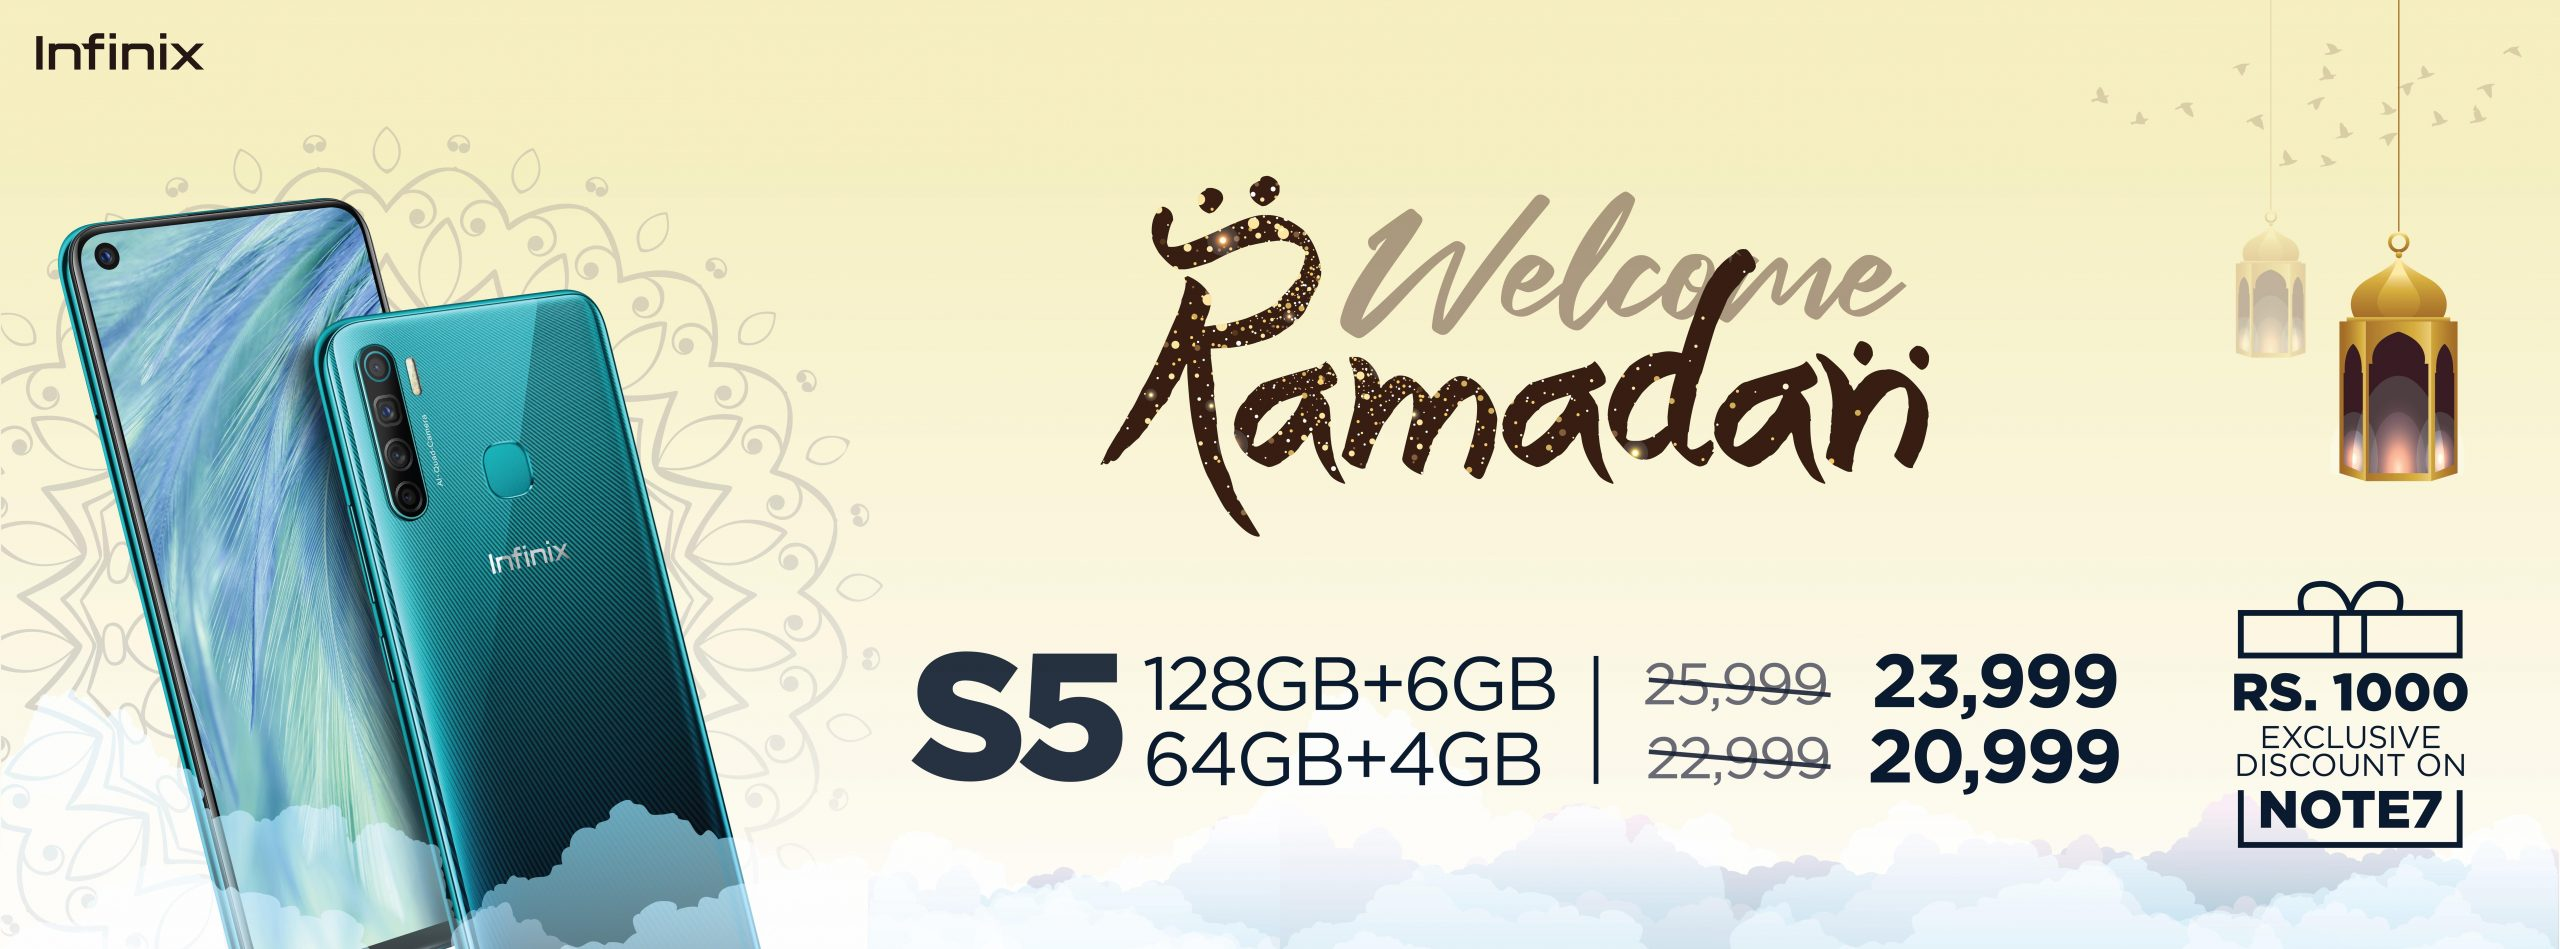 infinix-ramadan-techjuice